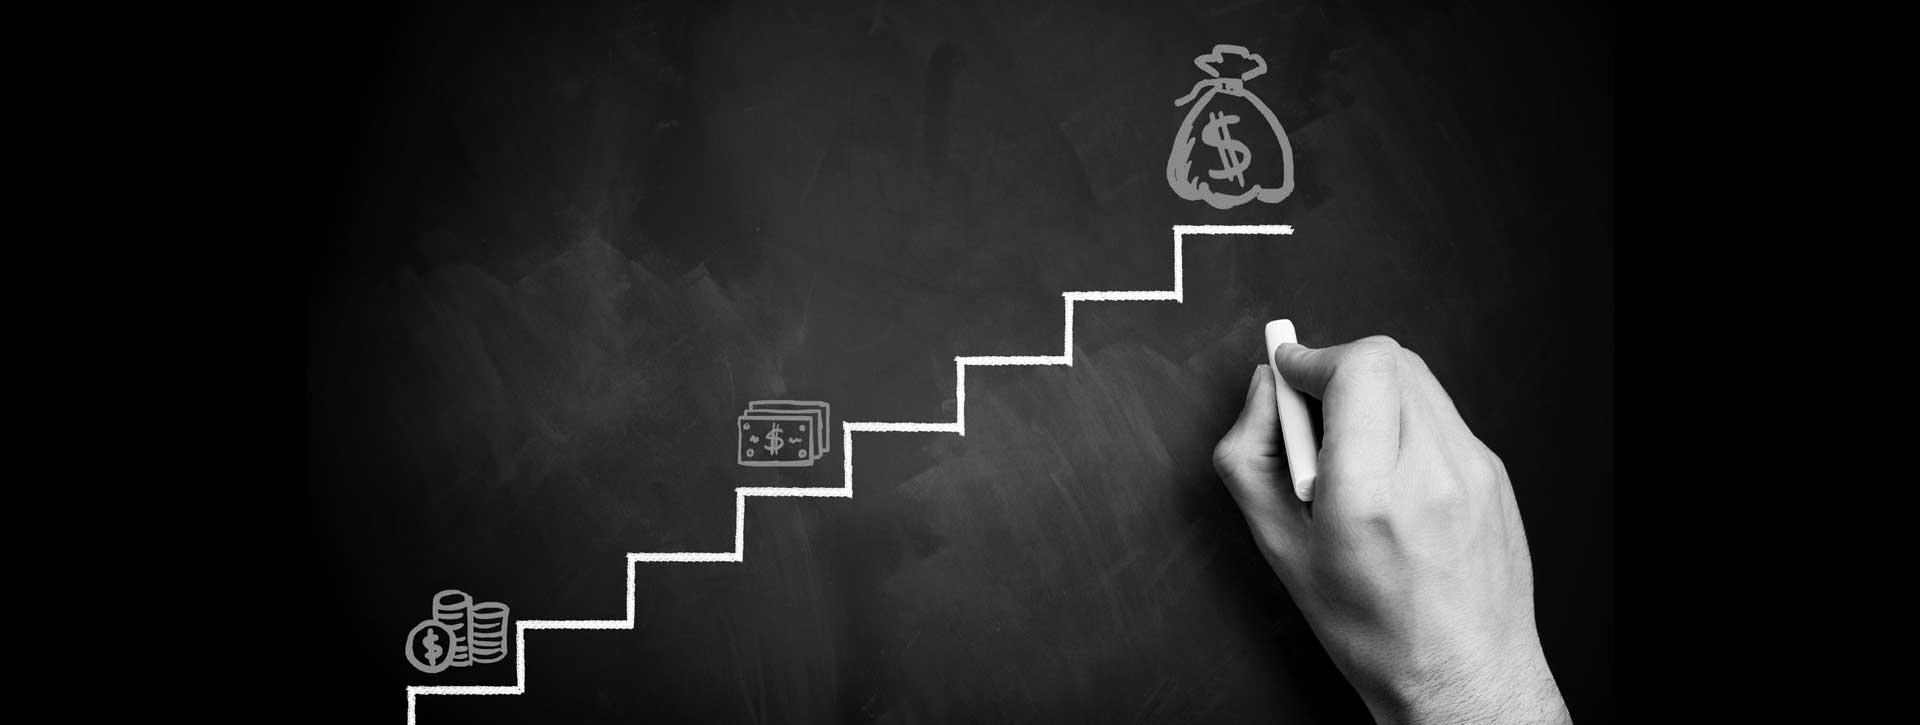 Compensation Management service in pune